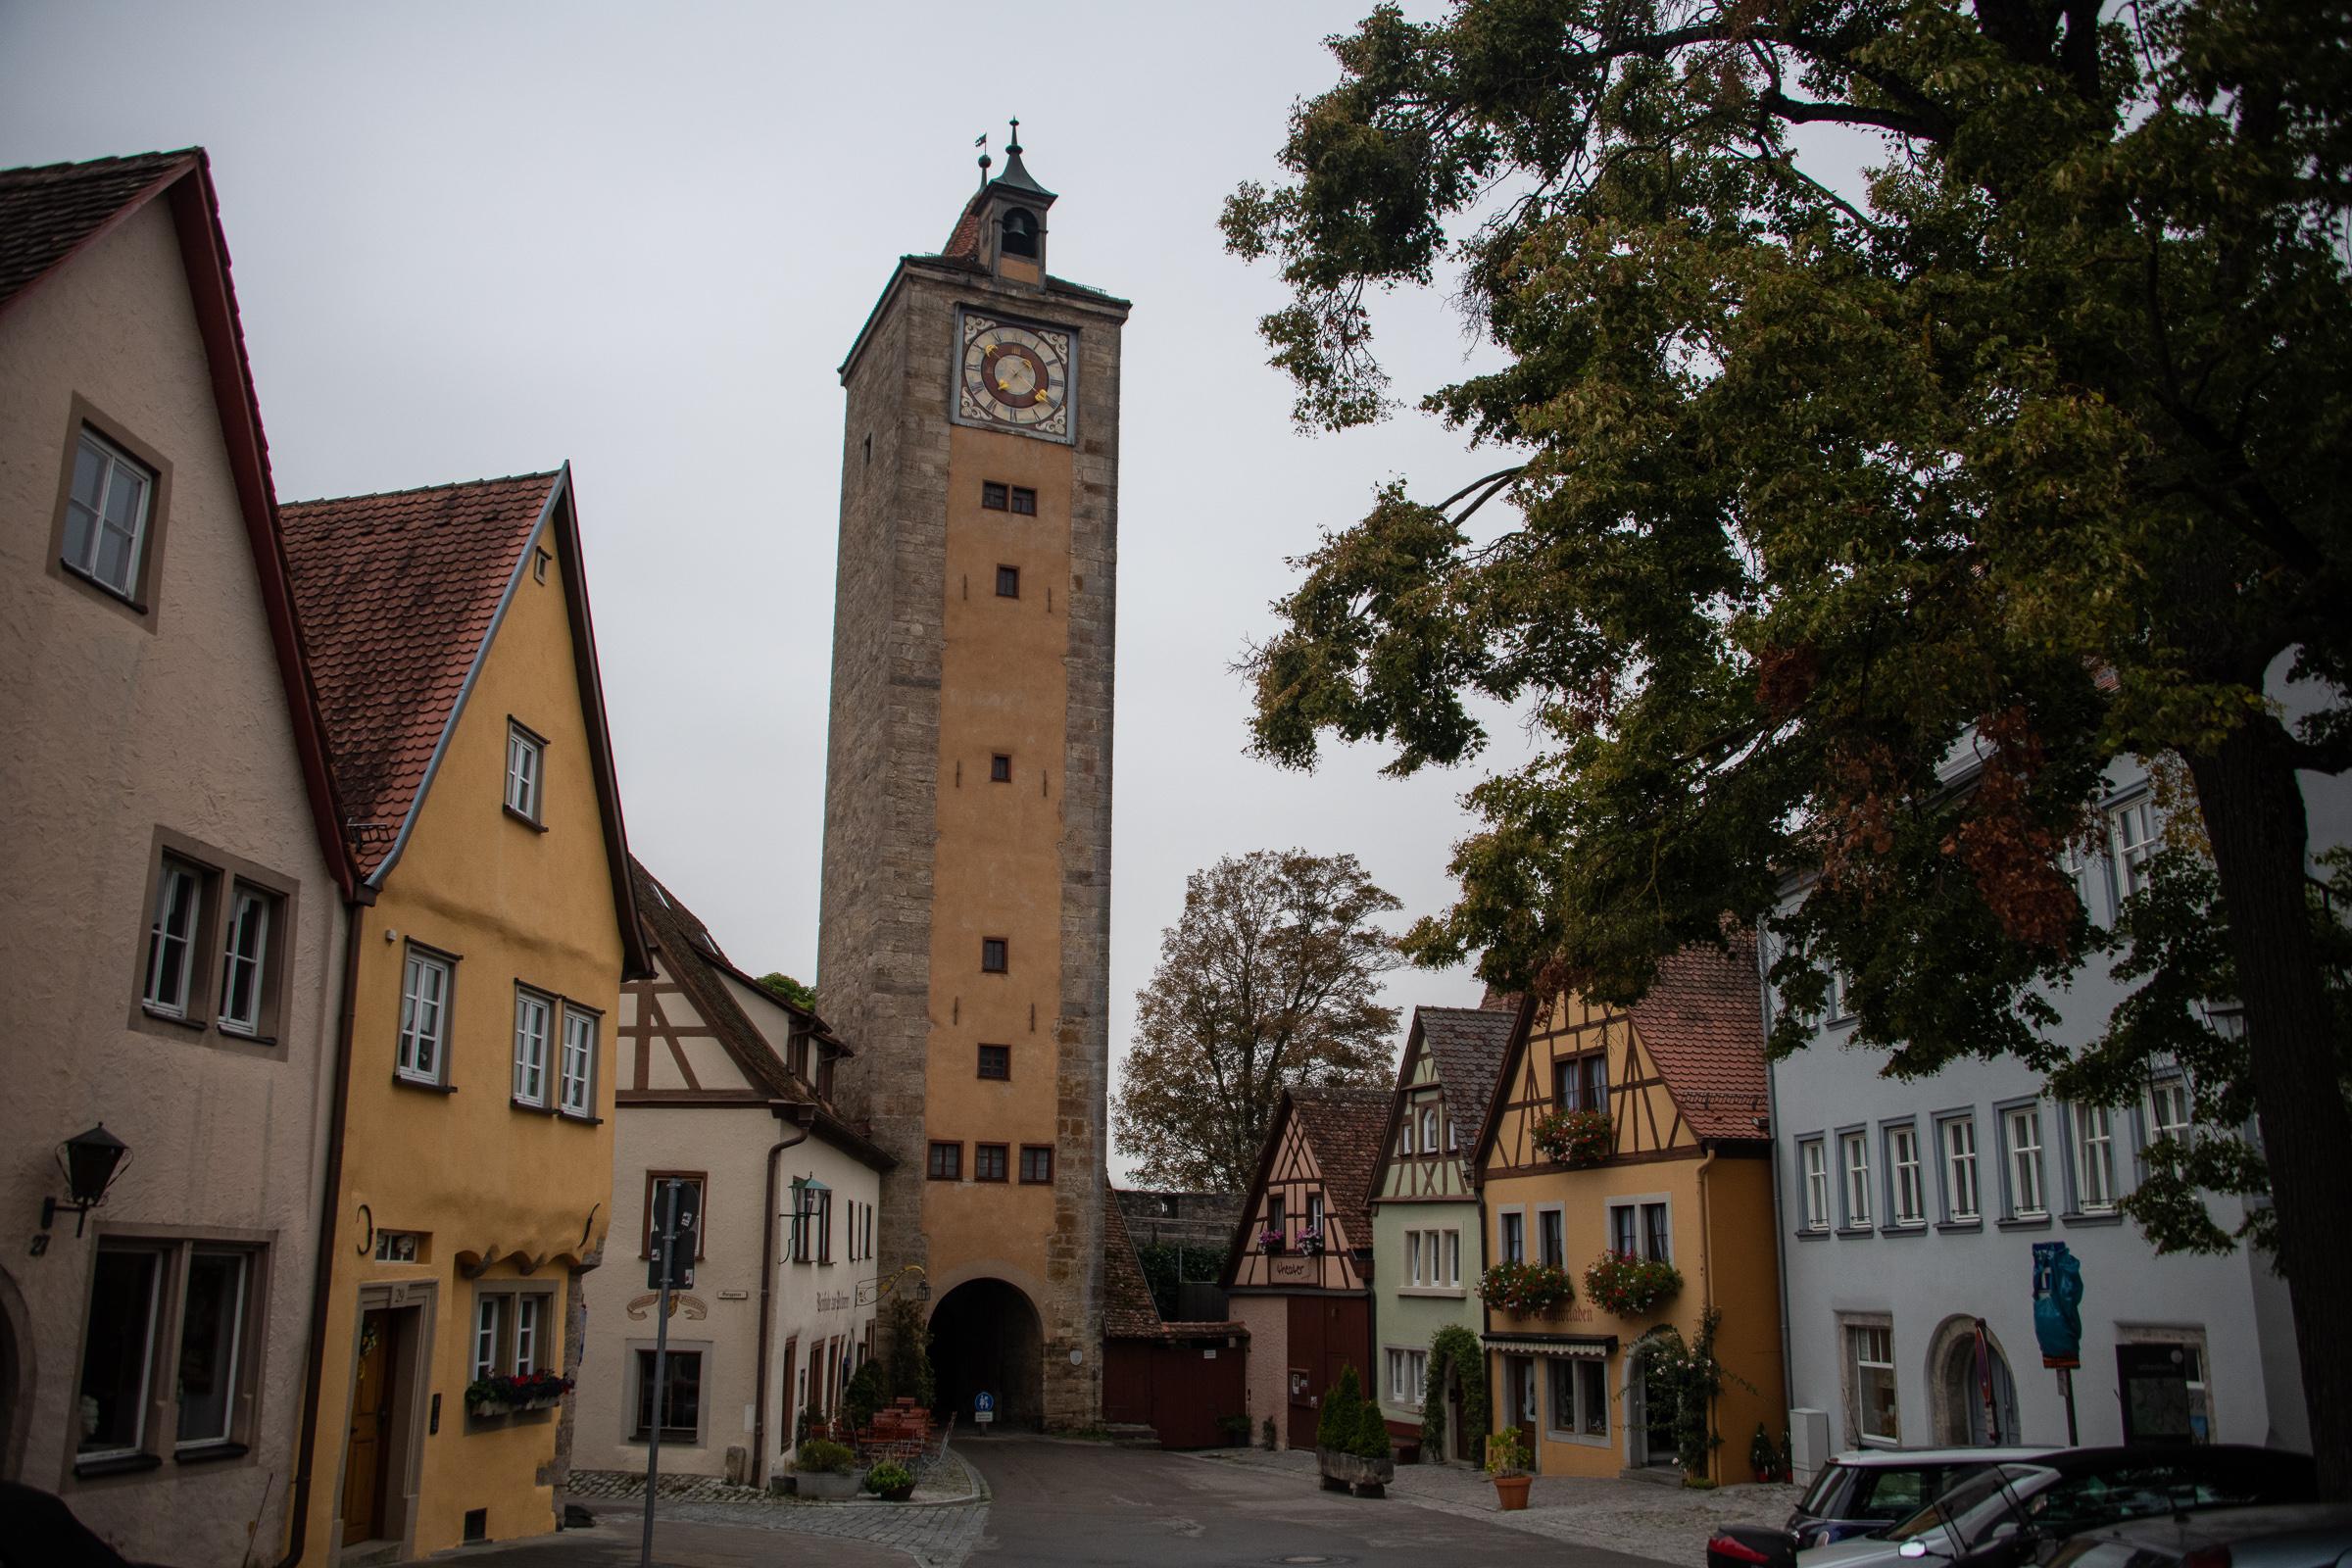 Inside of the Burgtor or Castle Gate